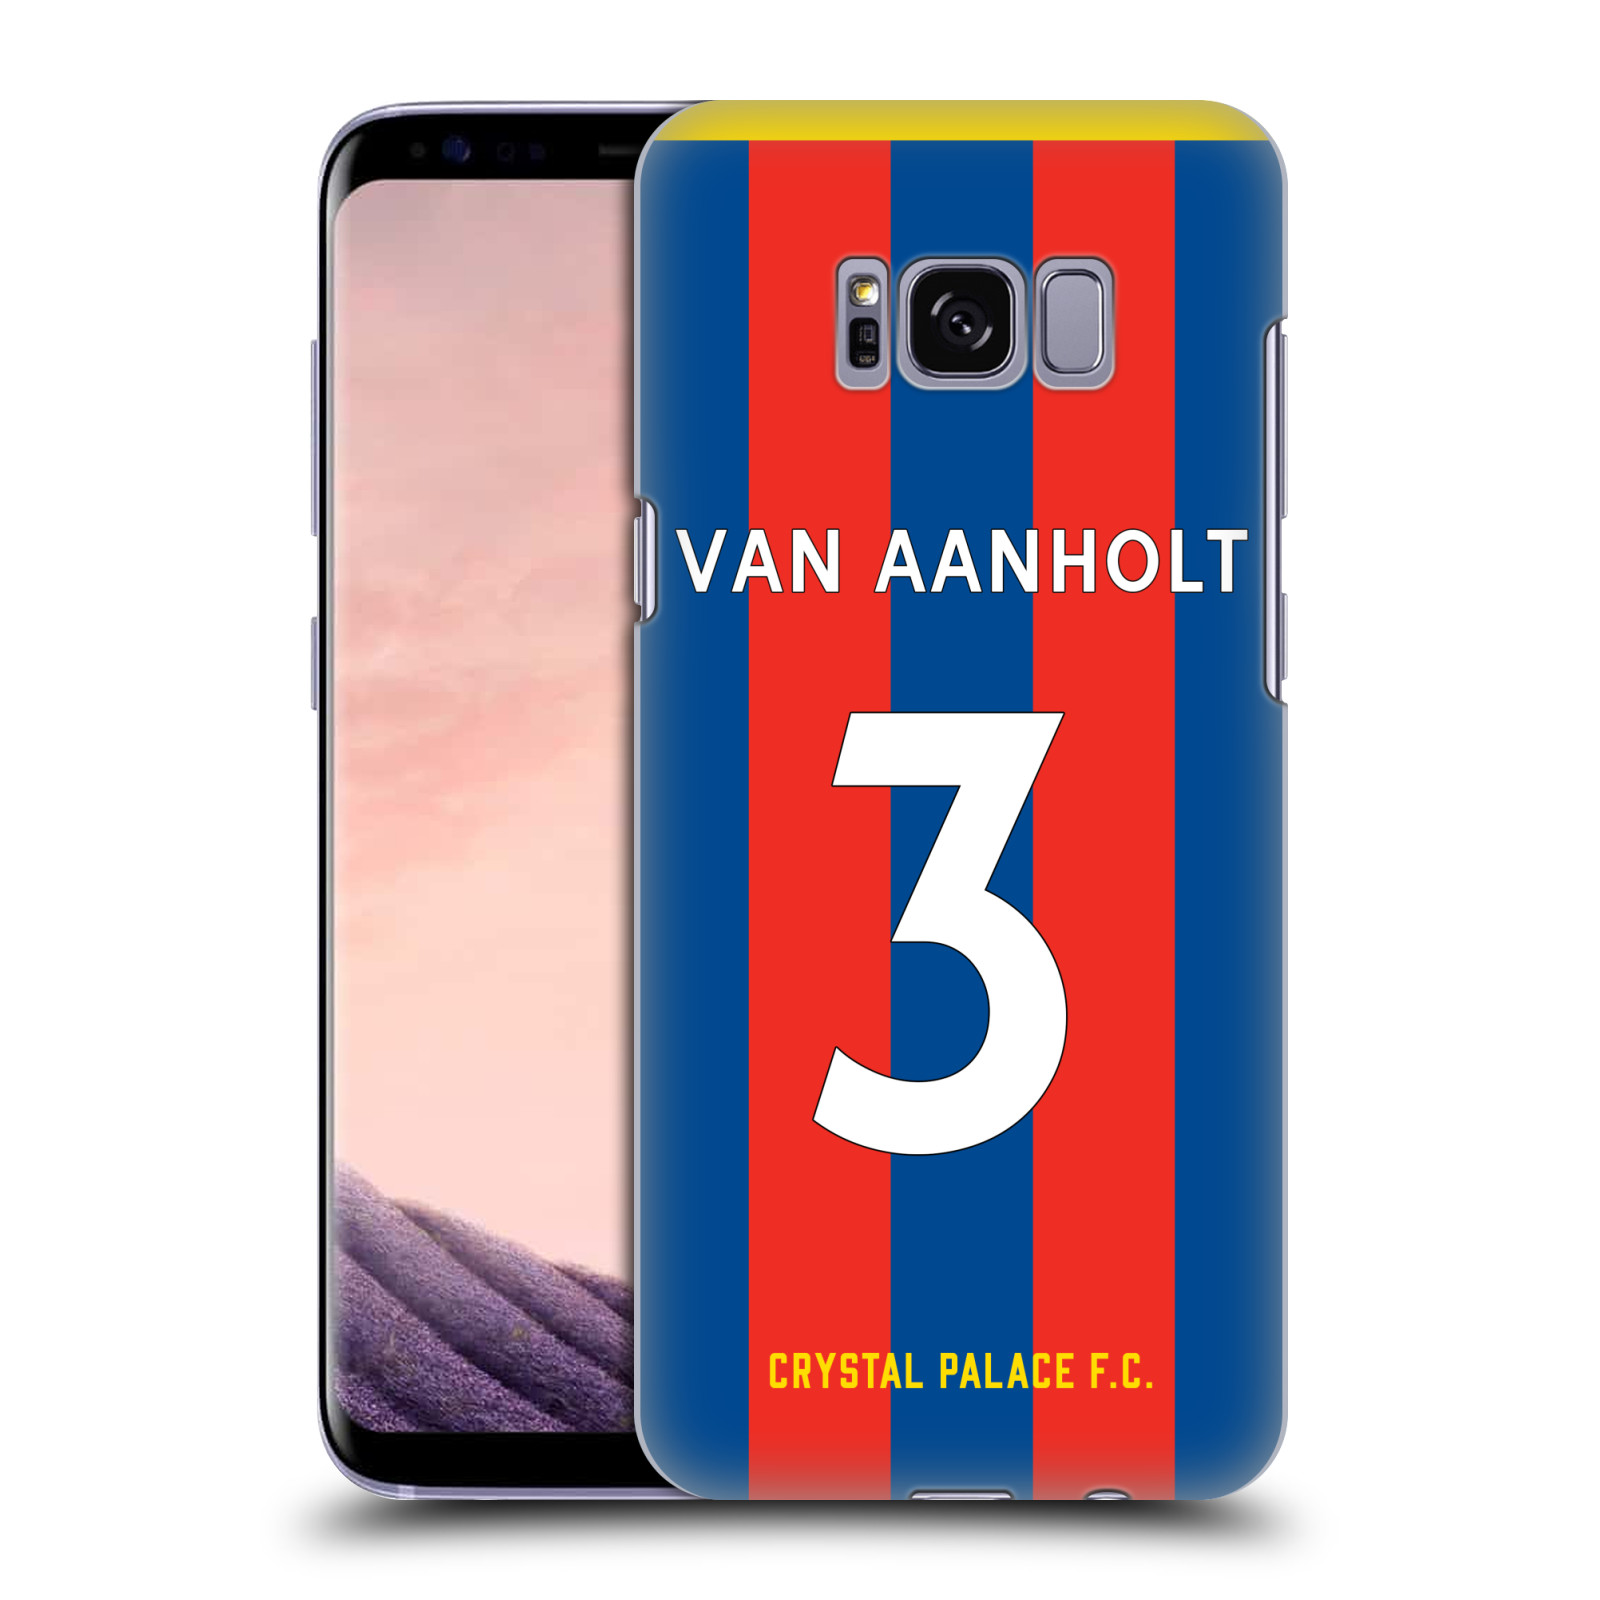 Oficial-Crystal-Palace-FC-2017-18-jugadores-Home-Kit-2-caso-para-telefonos-Samsung-1